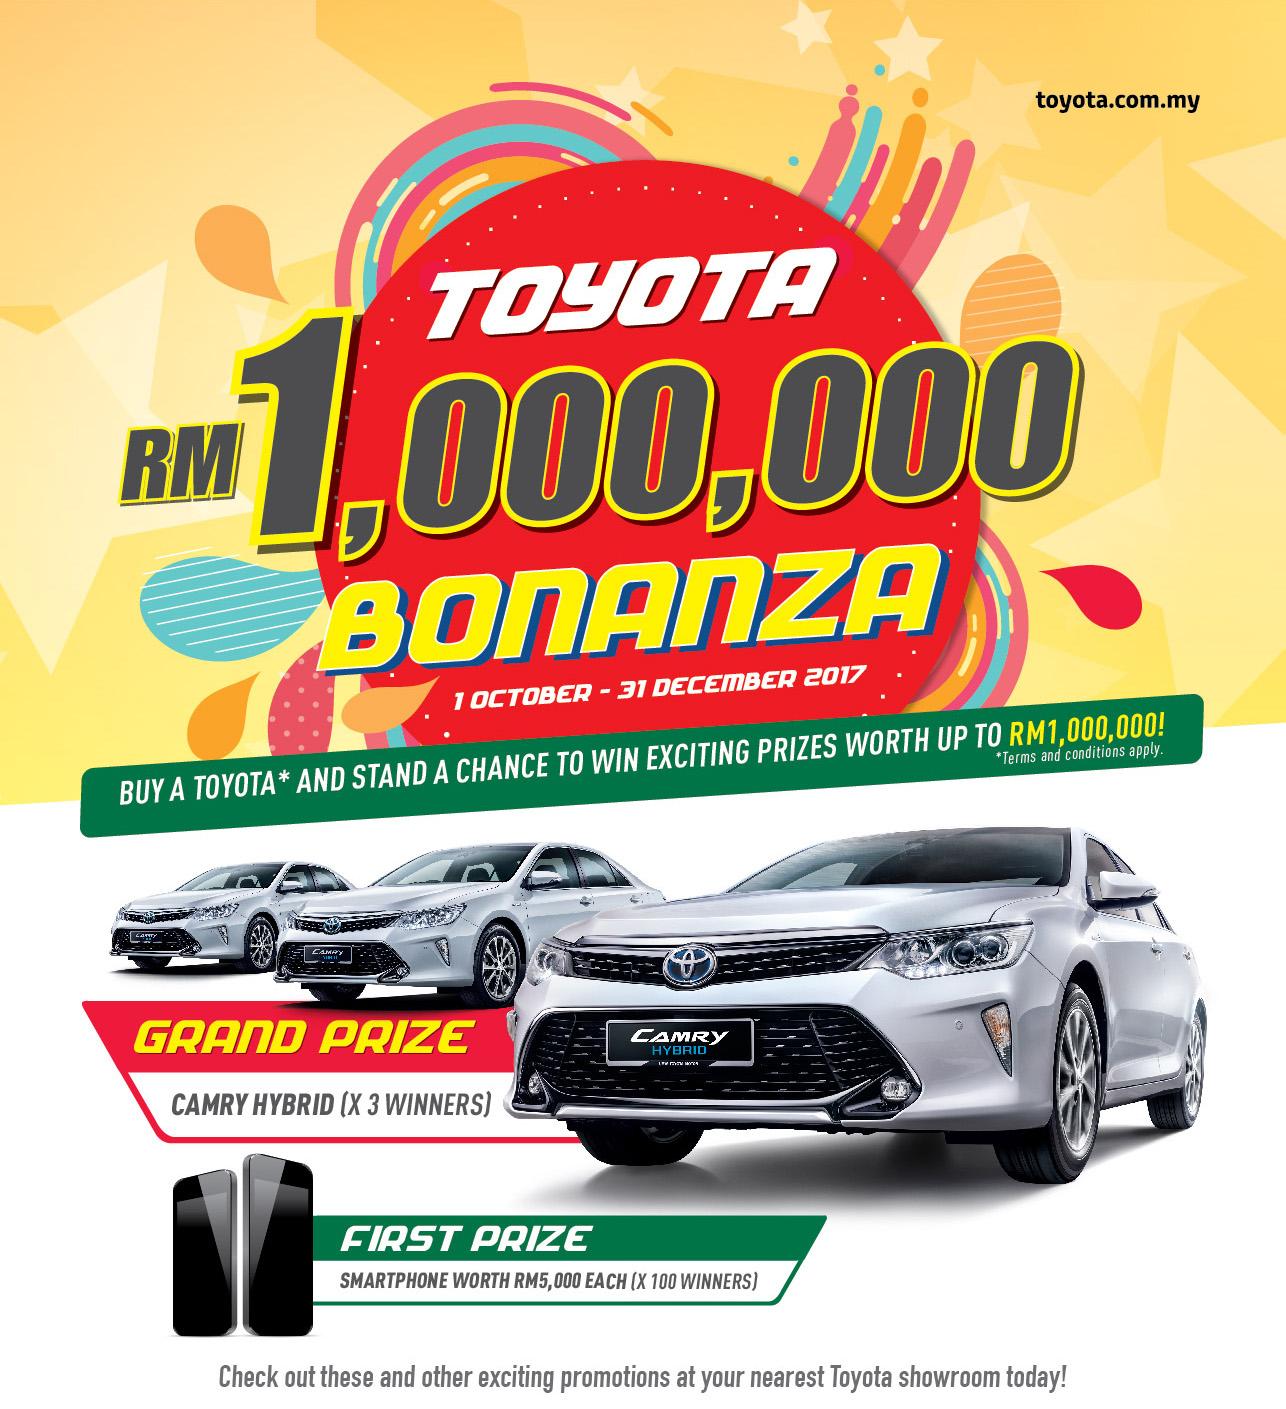 Toyota's New Year promotion | CarSifu